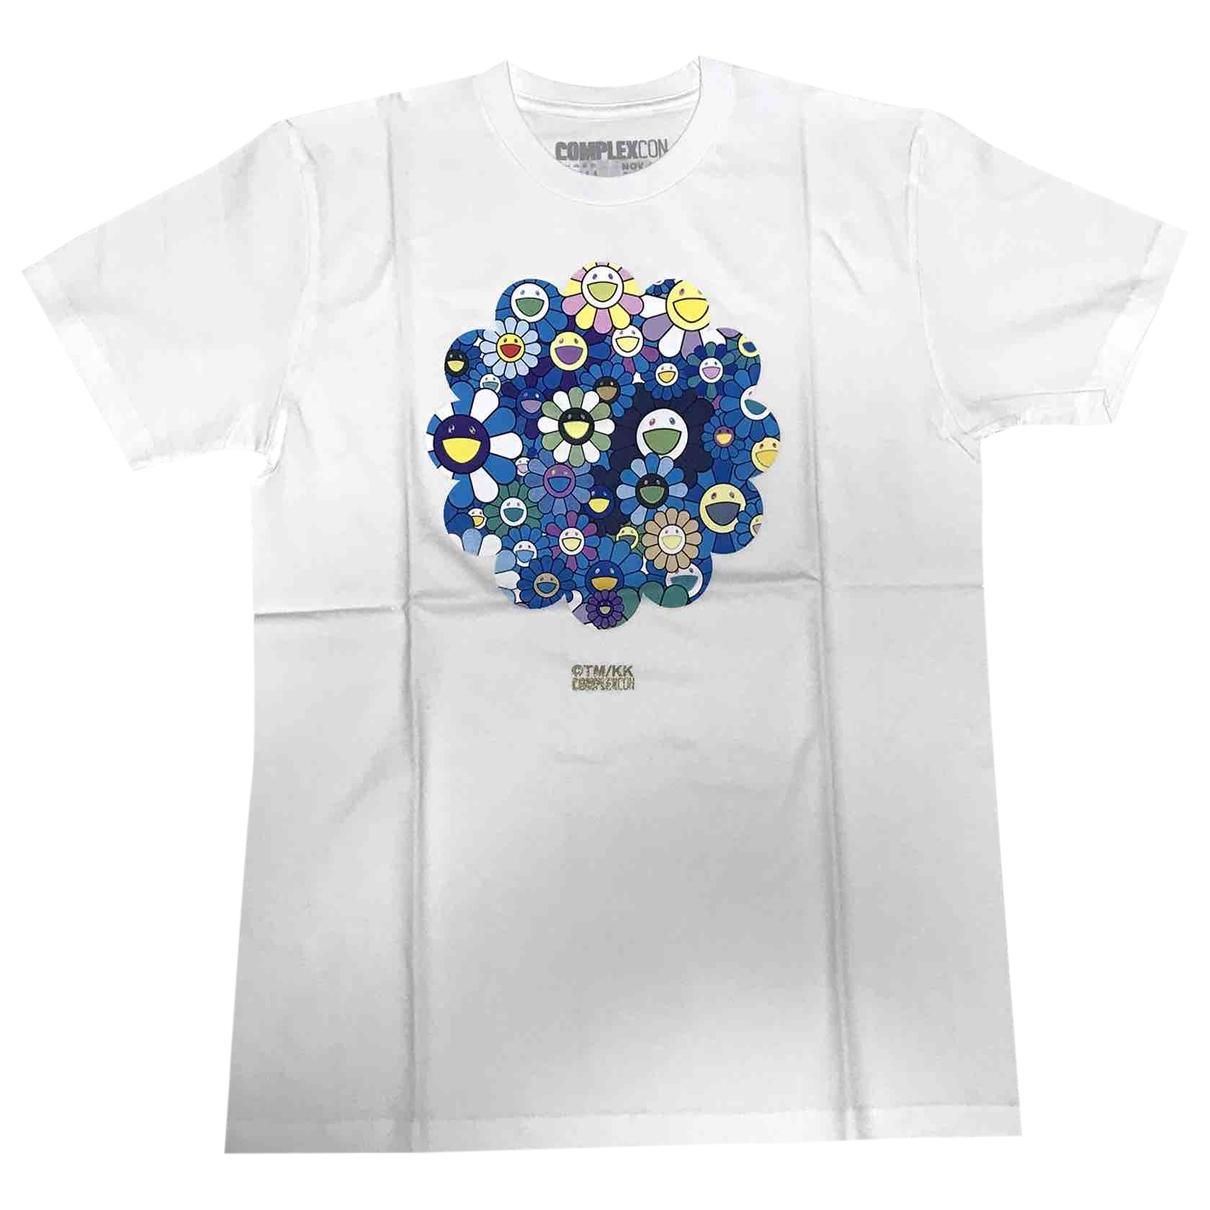 Takashi Murakami \N White Cotton  top for Women M International